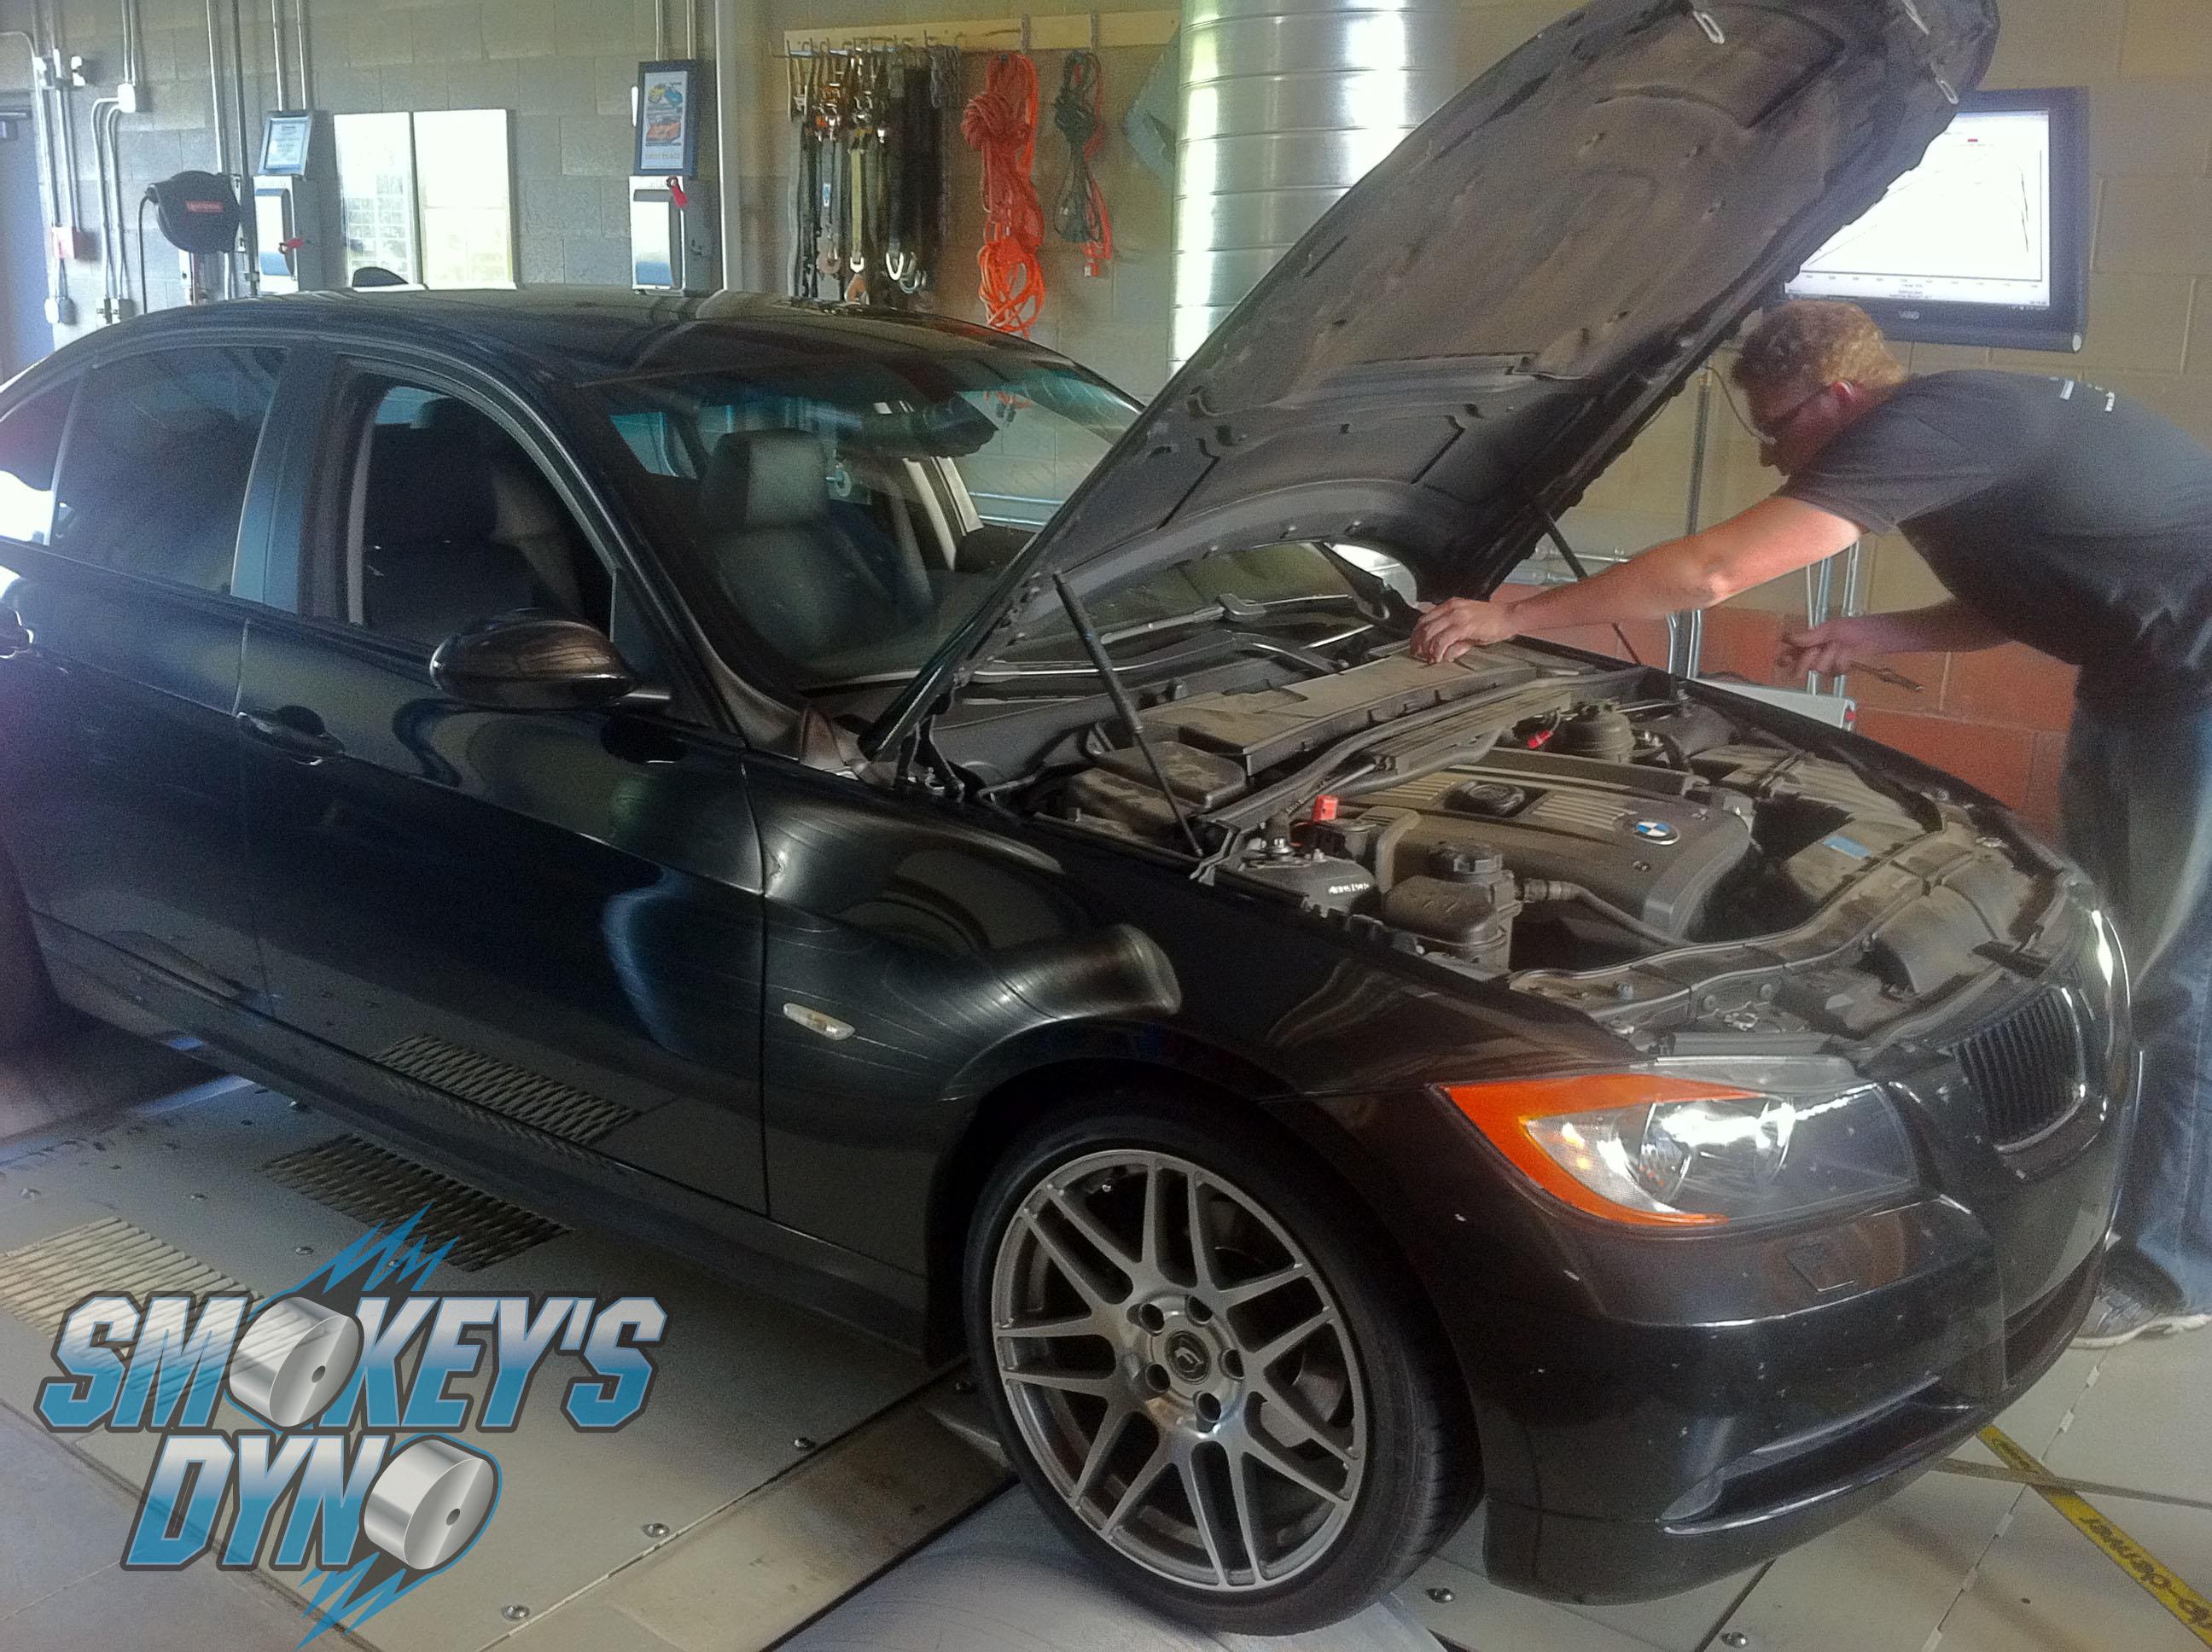 BMW 328xi - Tuning the N52 Engine - Smokey's Dyno Blog